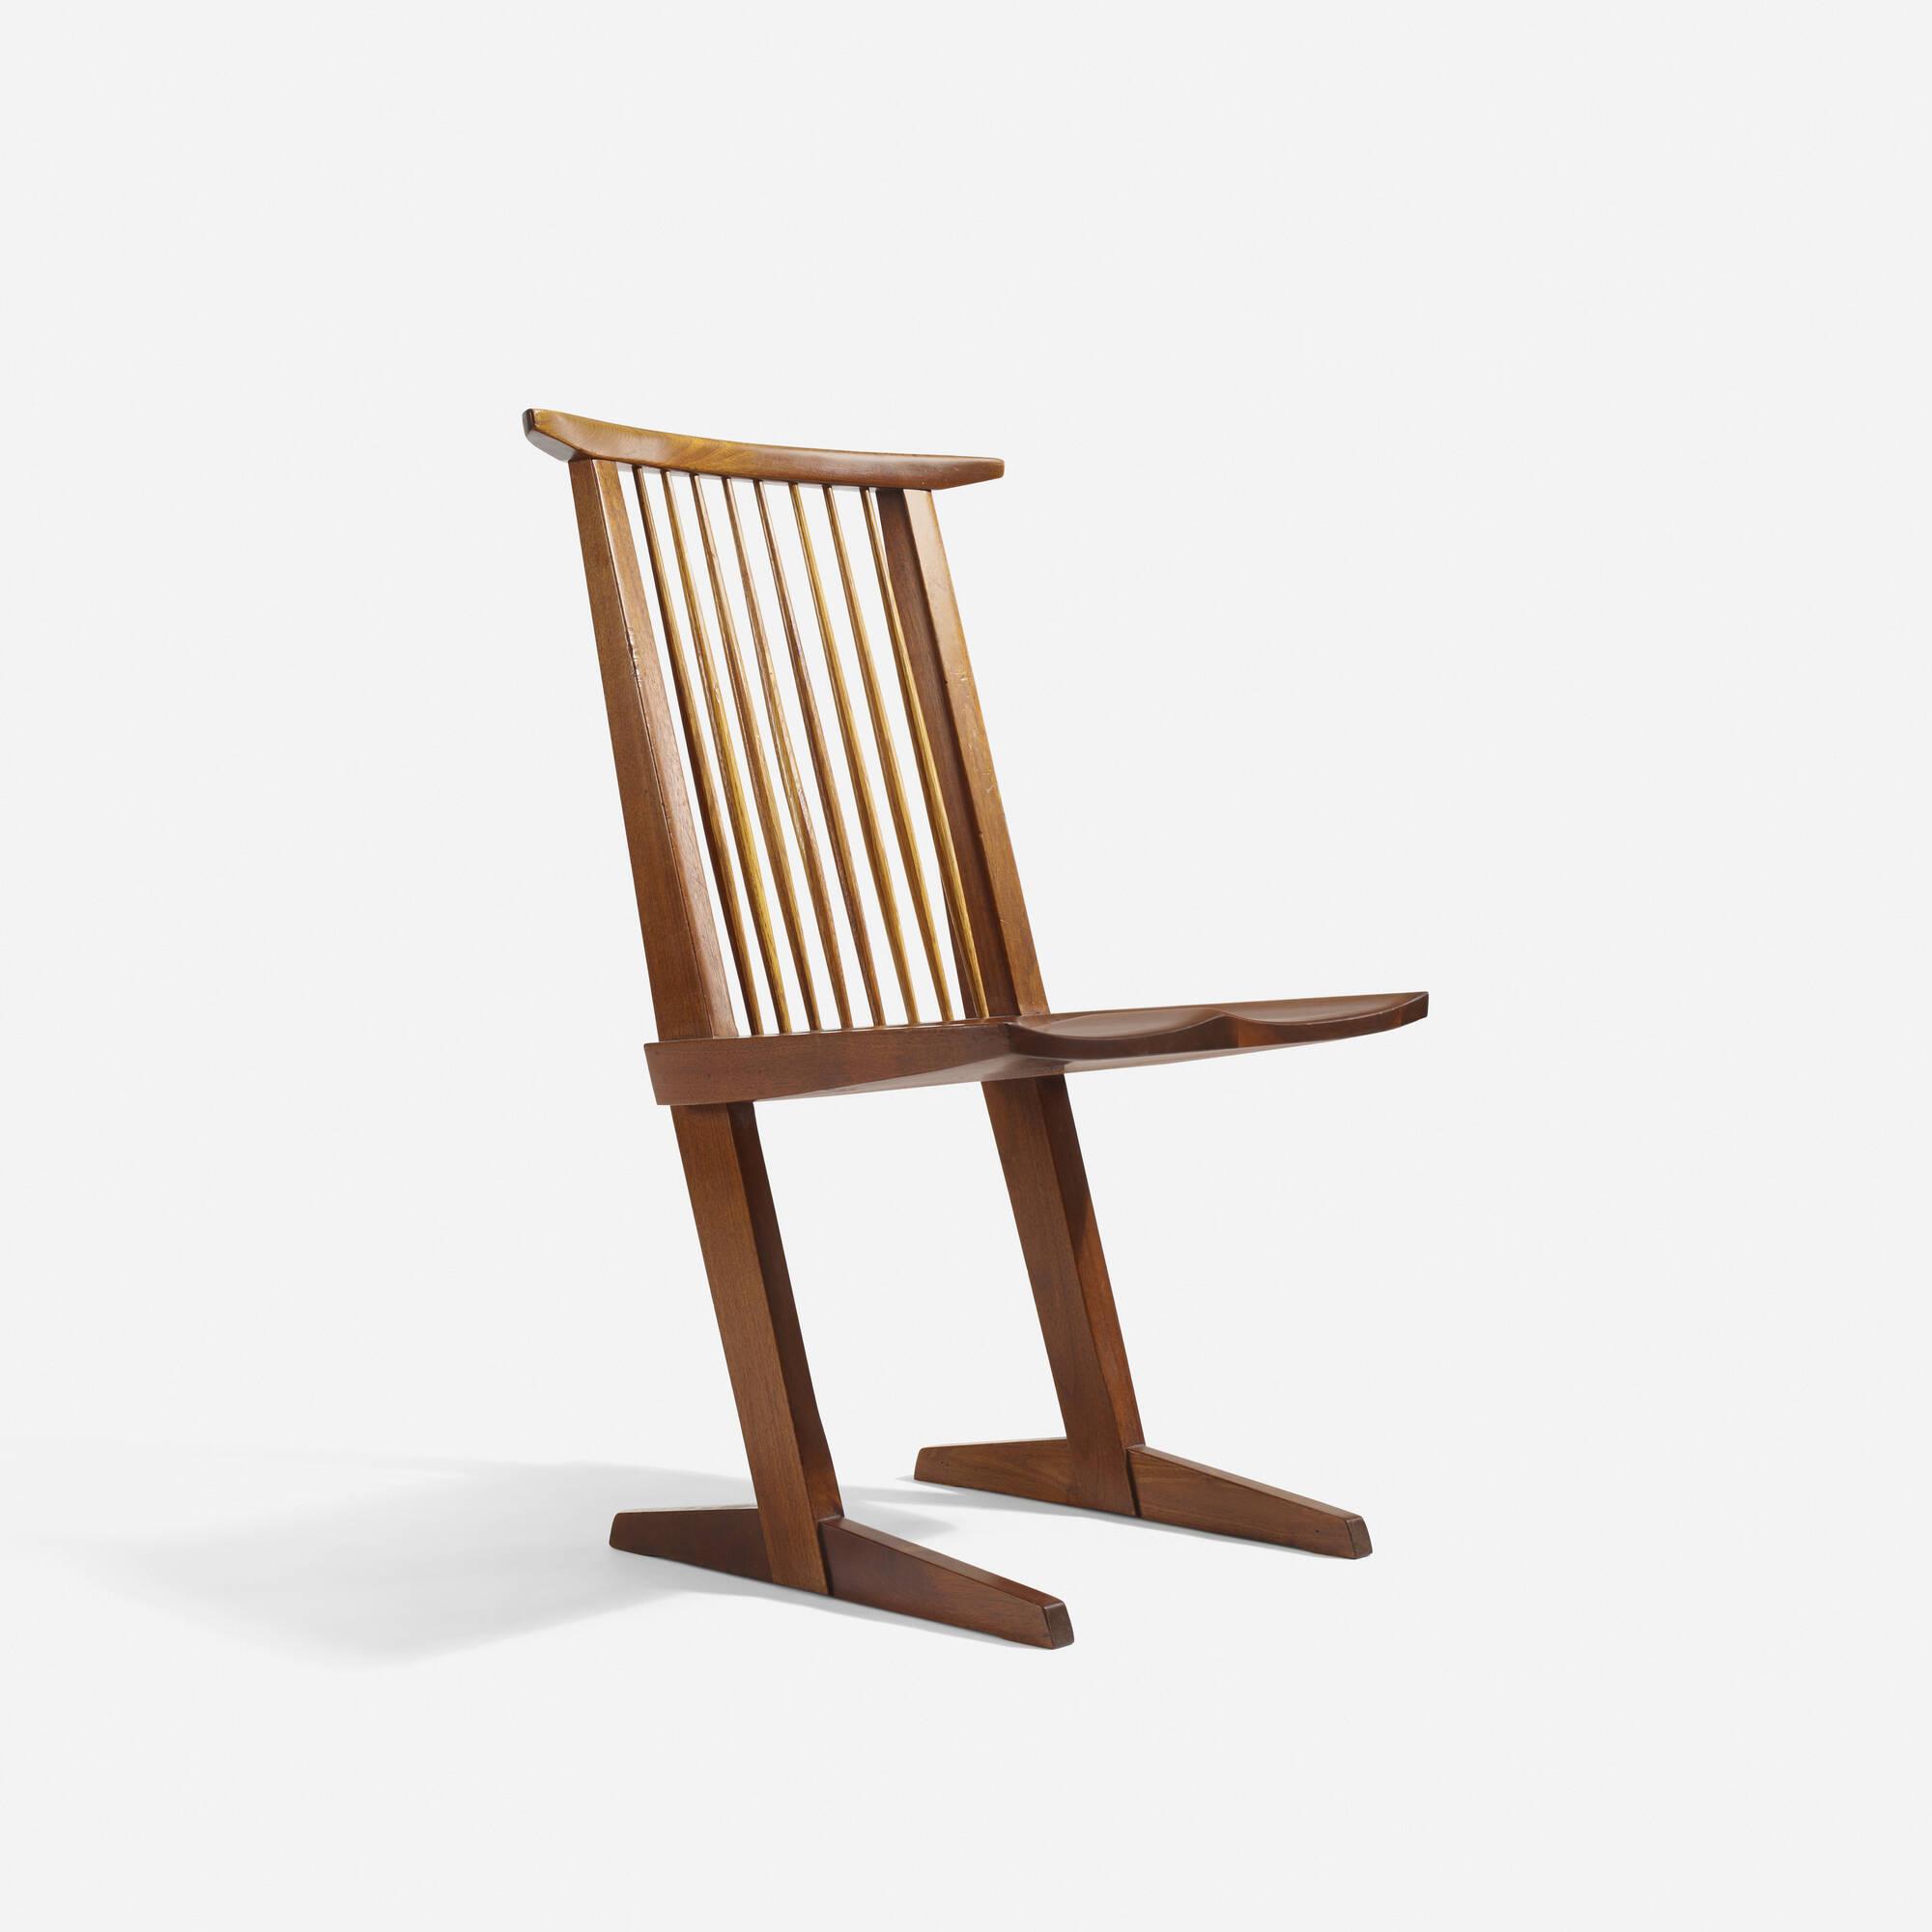 30 George Nakashima Conoid Dining Chairs set of six